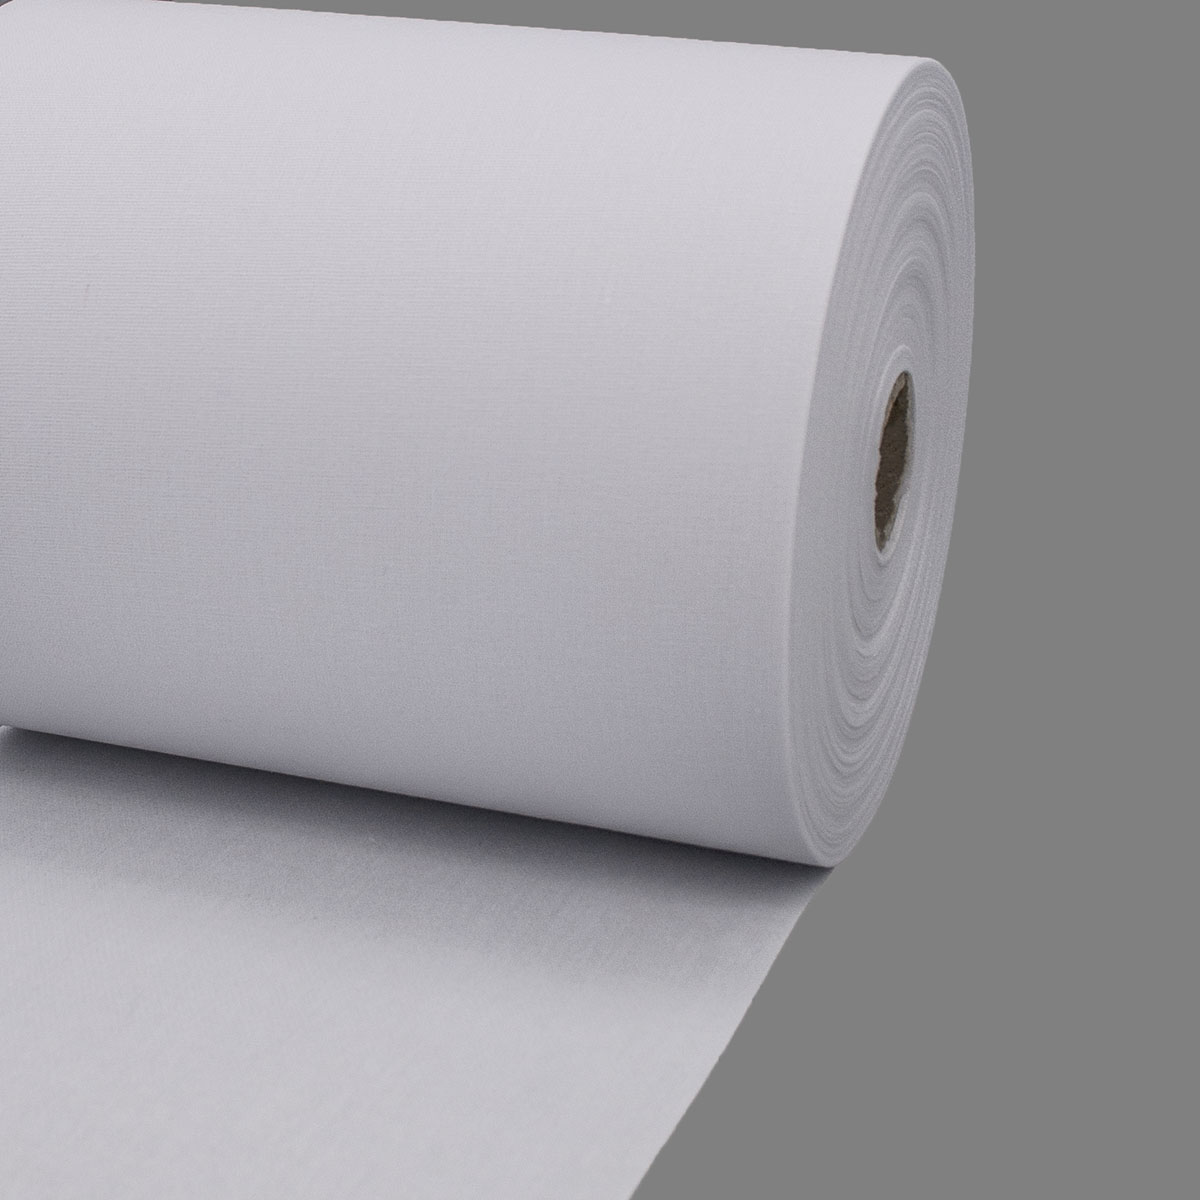 06-7200-GTH Лента люверсная 20см*50м клеевая белый х/б ГР